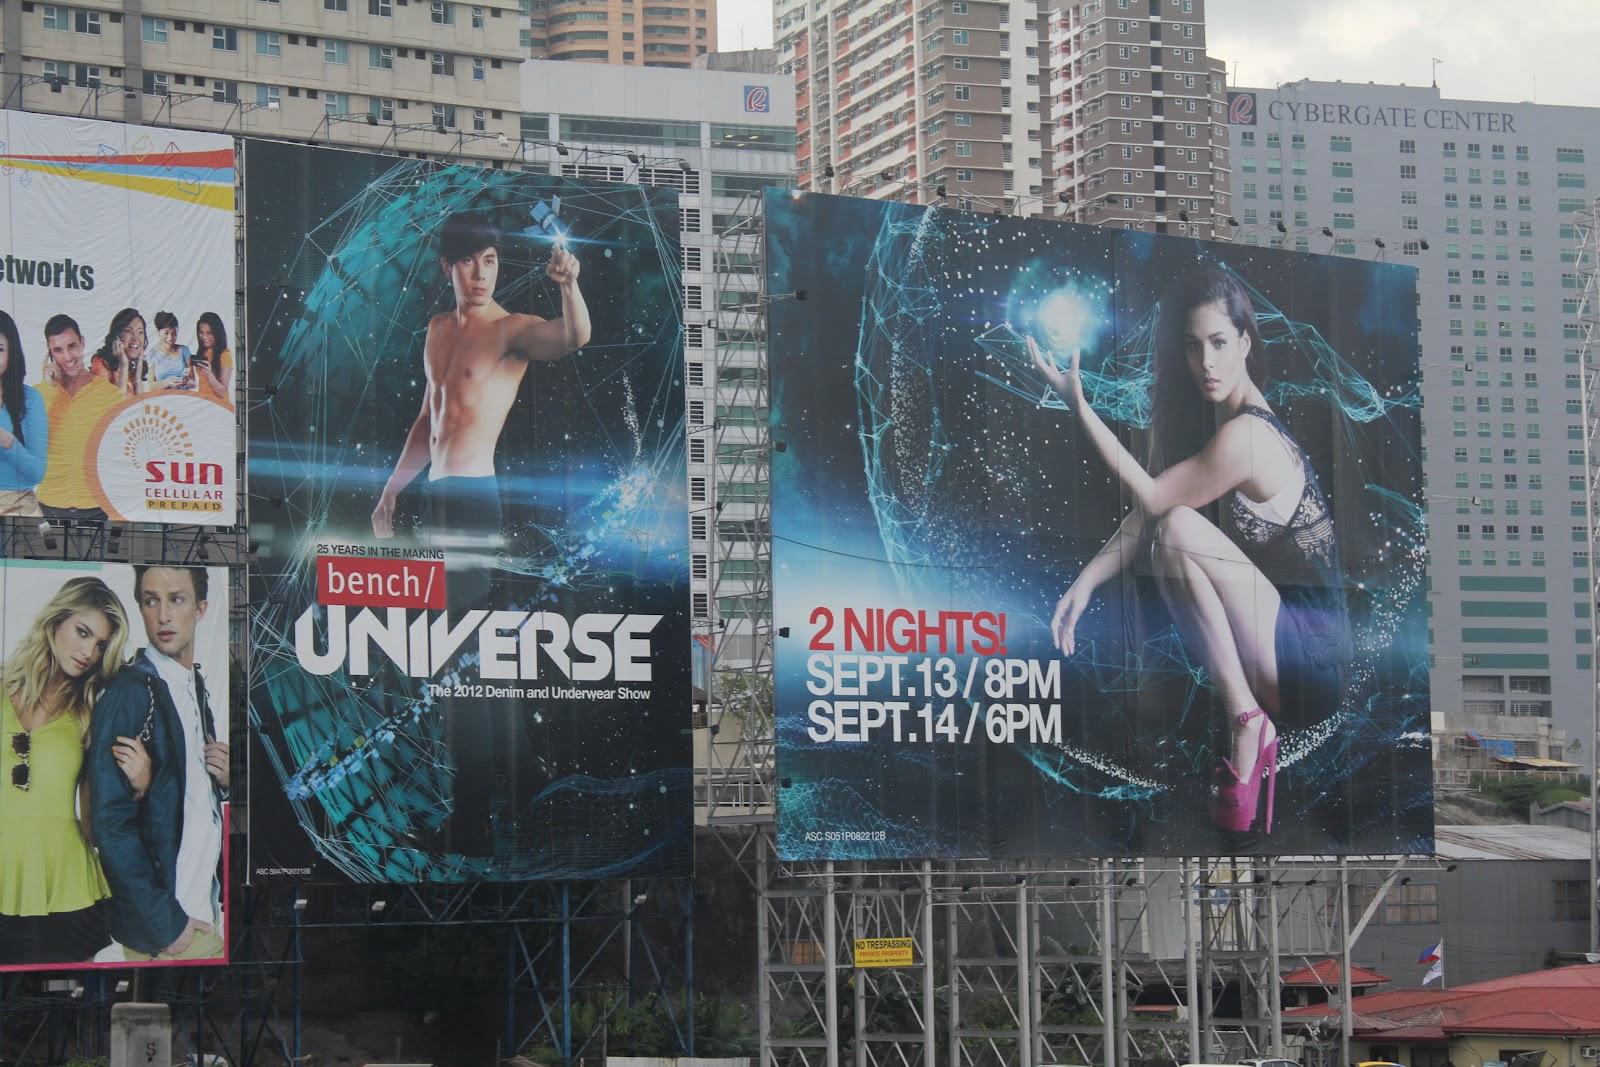 Bench Universe, The 2012 Denim Underwear Show   THE WEB ...